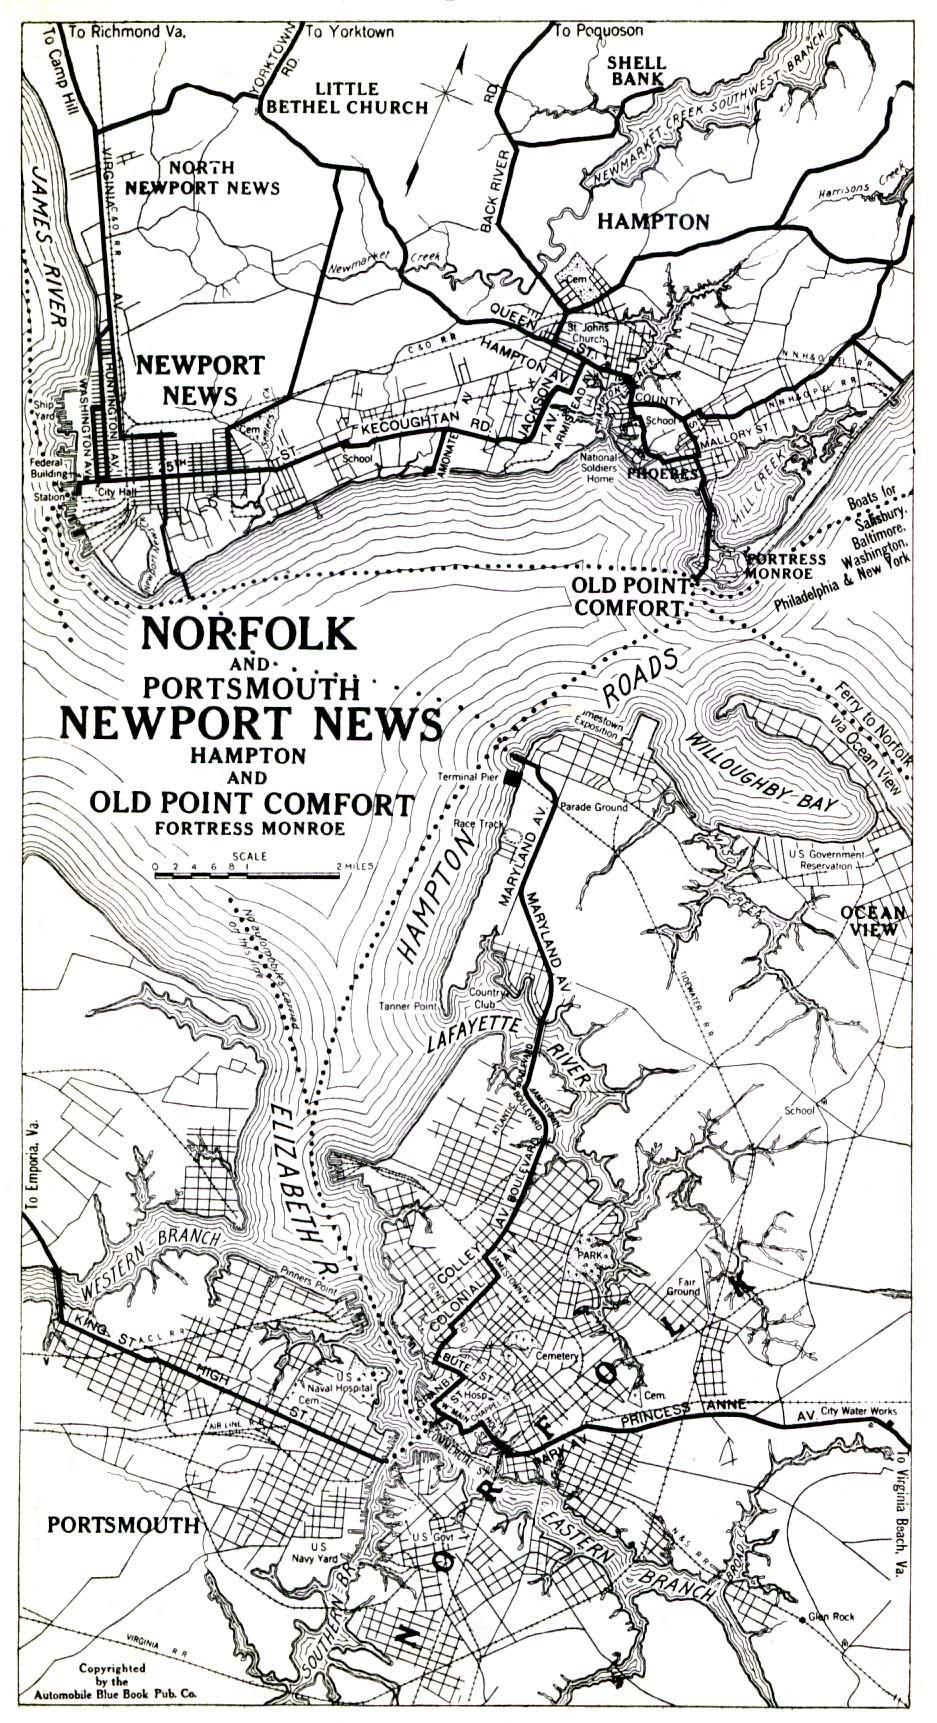 Norfolk Naval Base Building Map Images SciFi Pinterest - Maps united states naval base